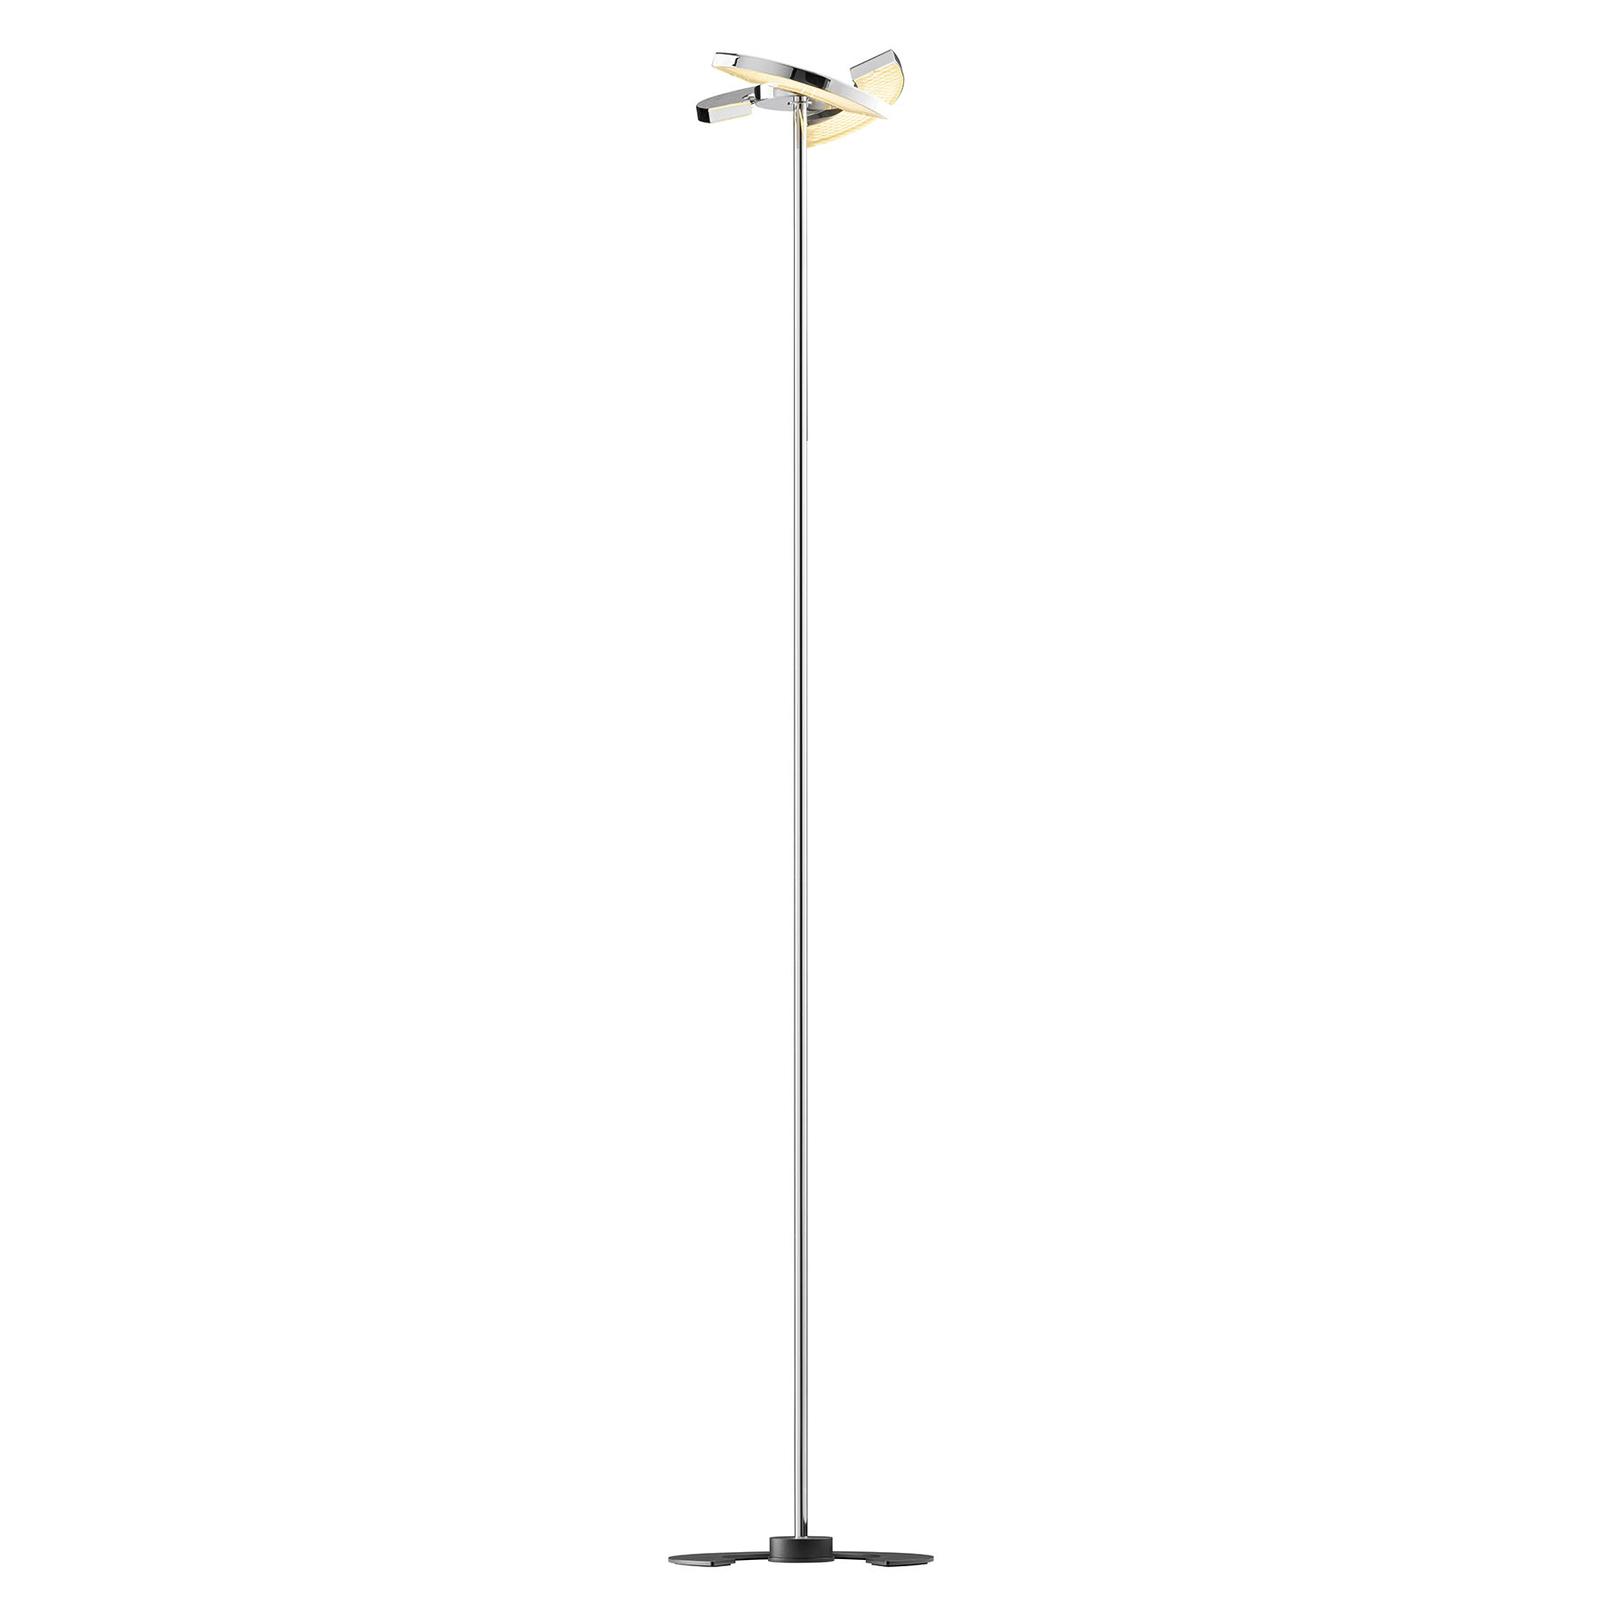 OLIGO Trinity LED-gulvlampe 3-delt, bevægelig